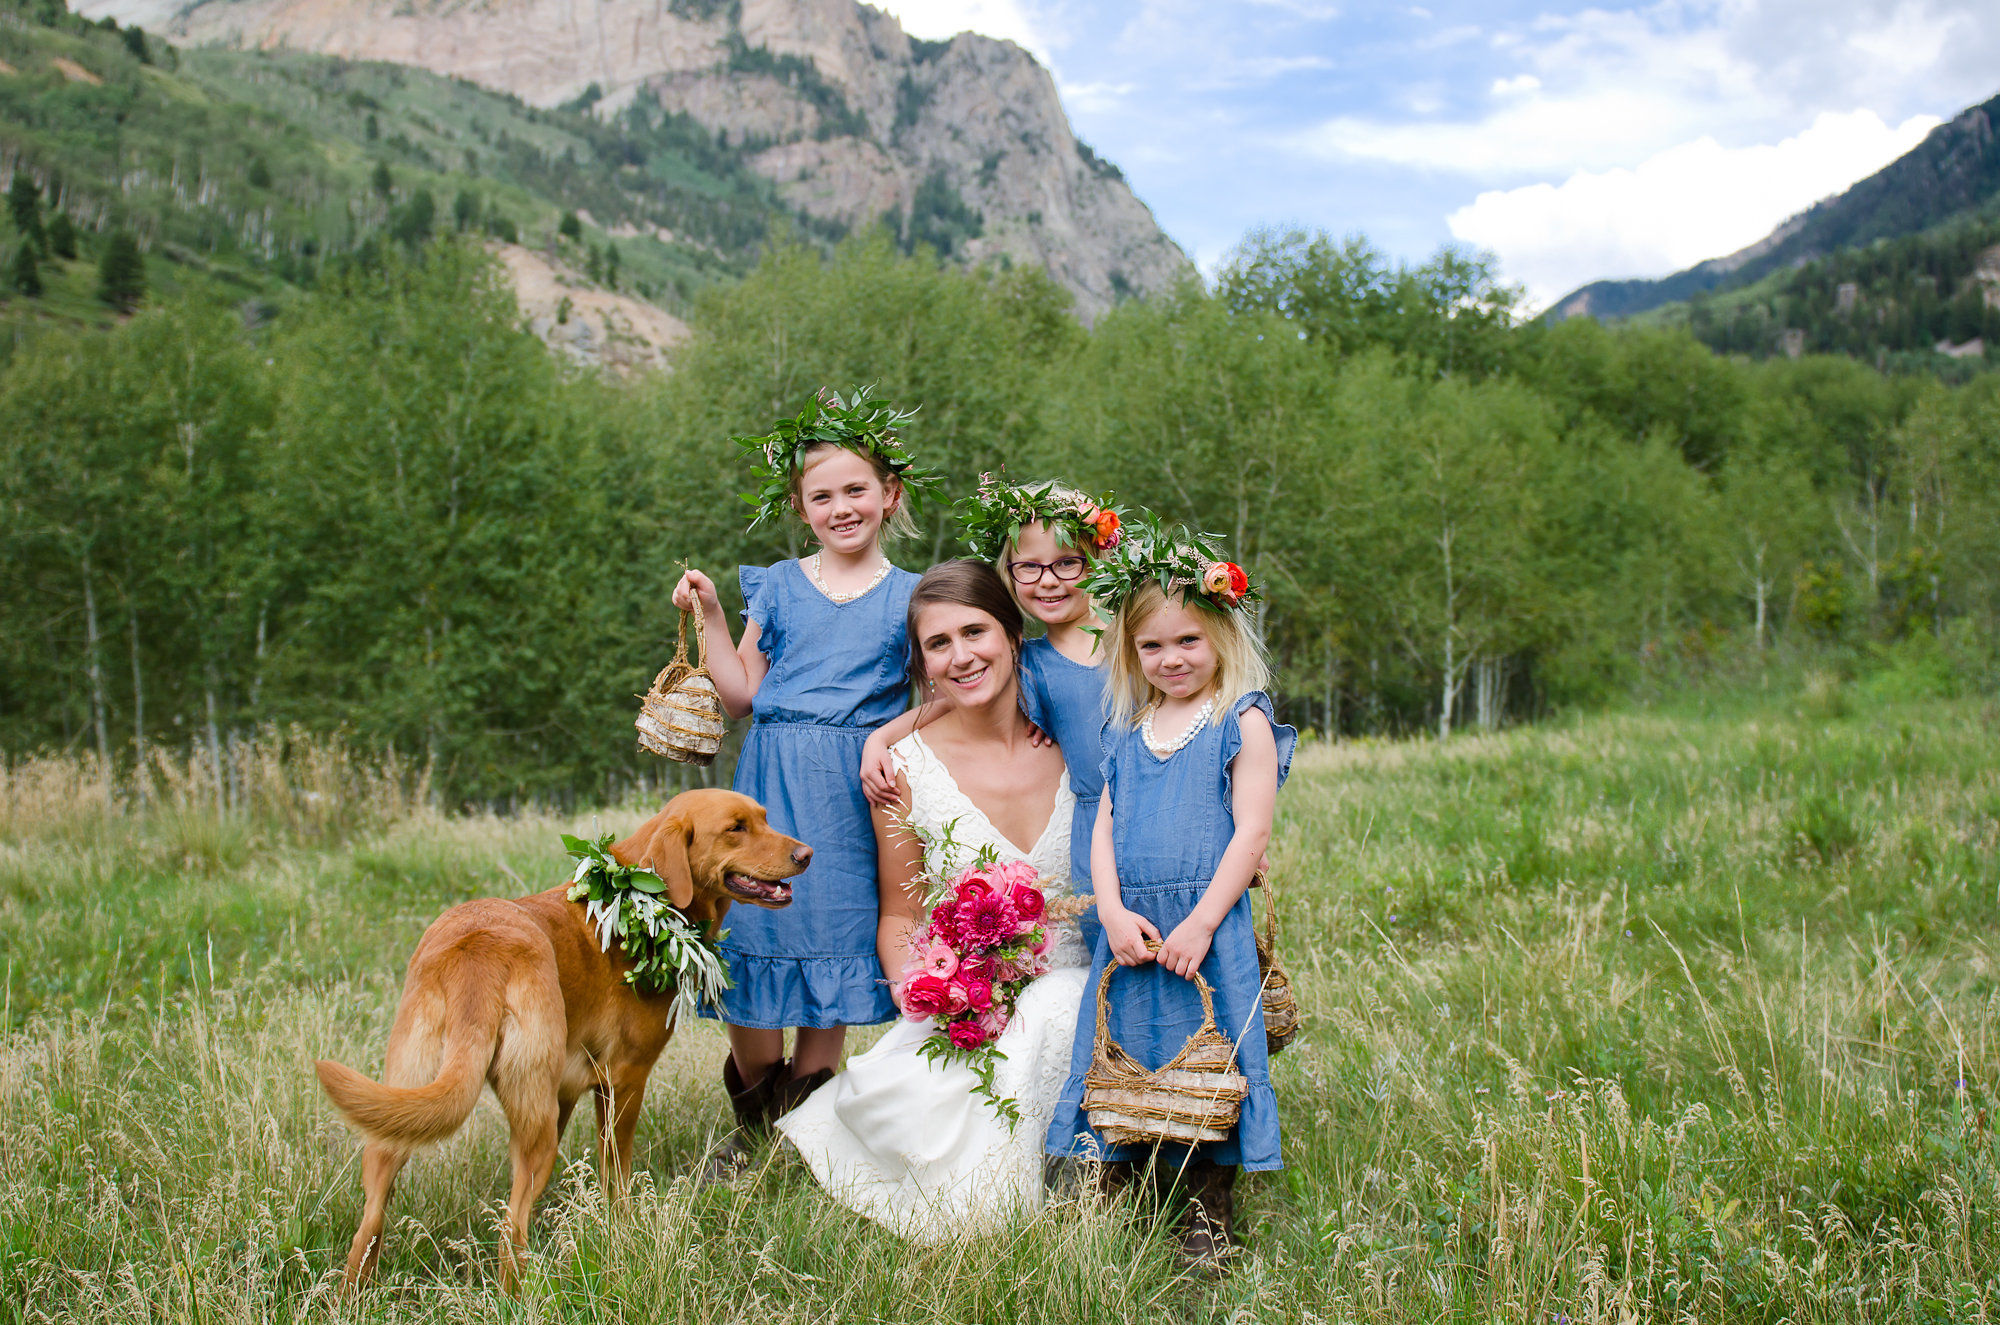 A Bride's Best Girls